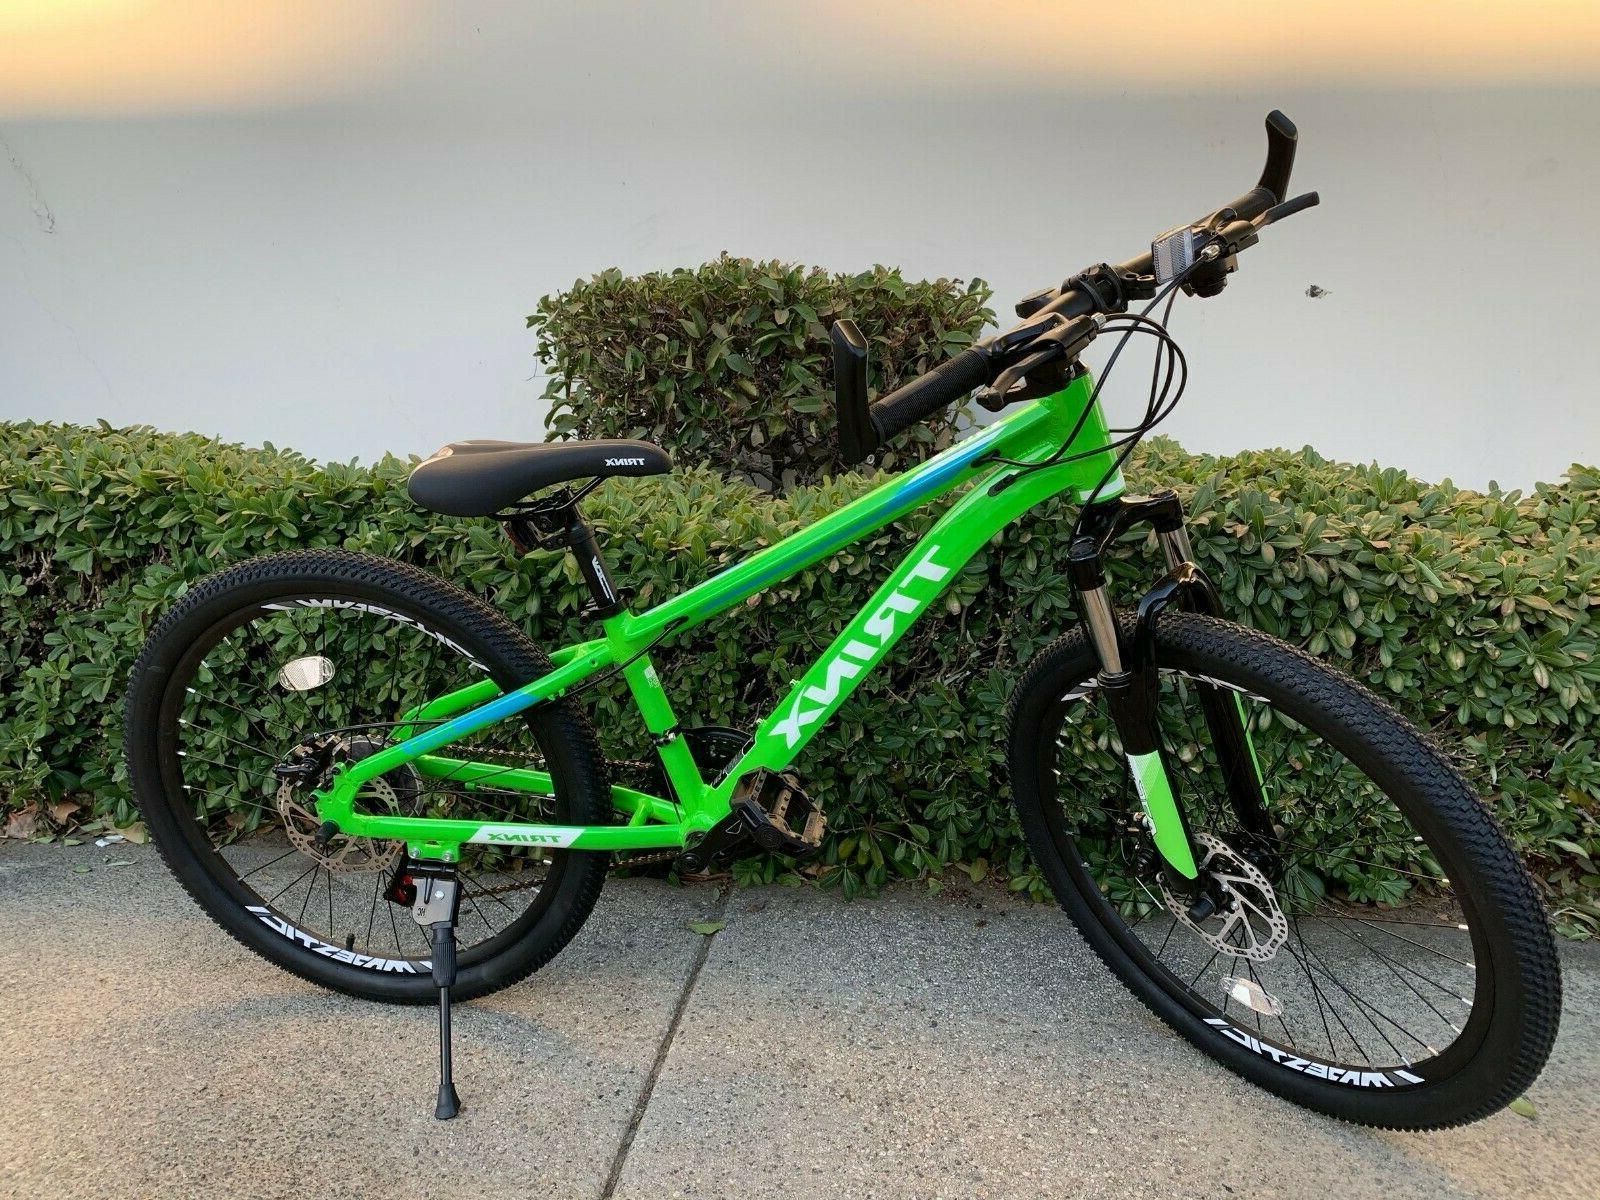 trinx mtb mountain bike 24 inch 21